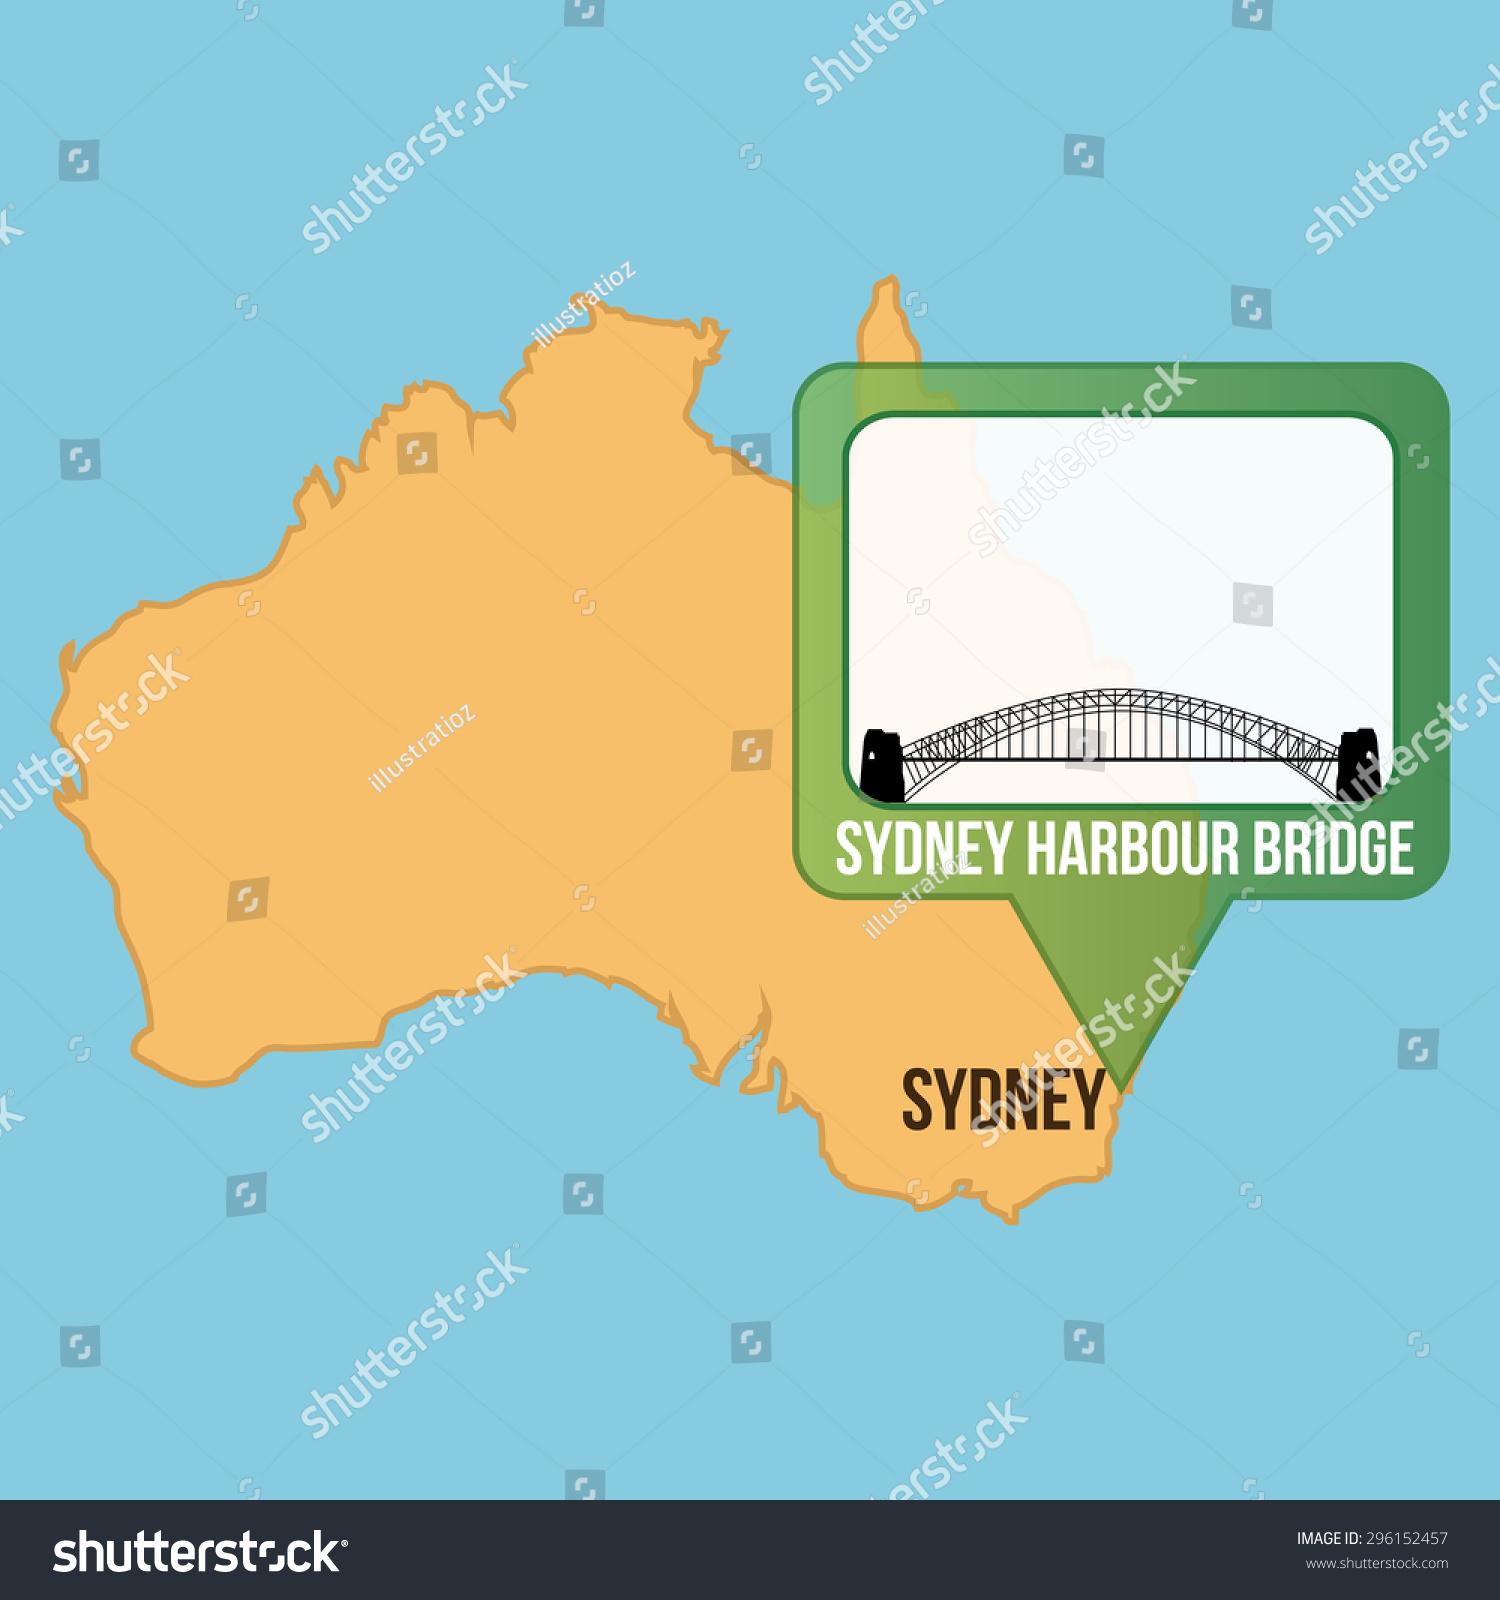 Where Is Sydney Australia On A Map.Isolated Map Australia Sydney Harbour Bridge Stock Vector Royalty